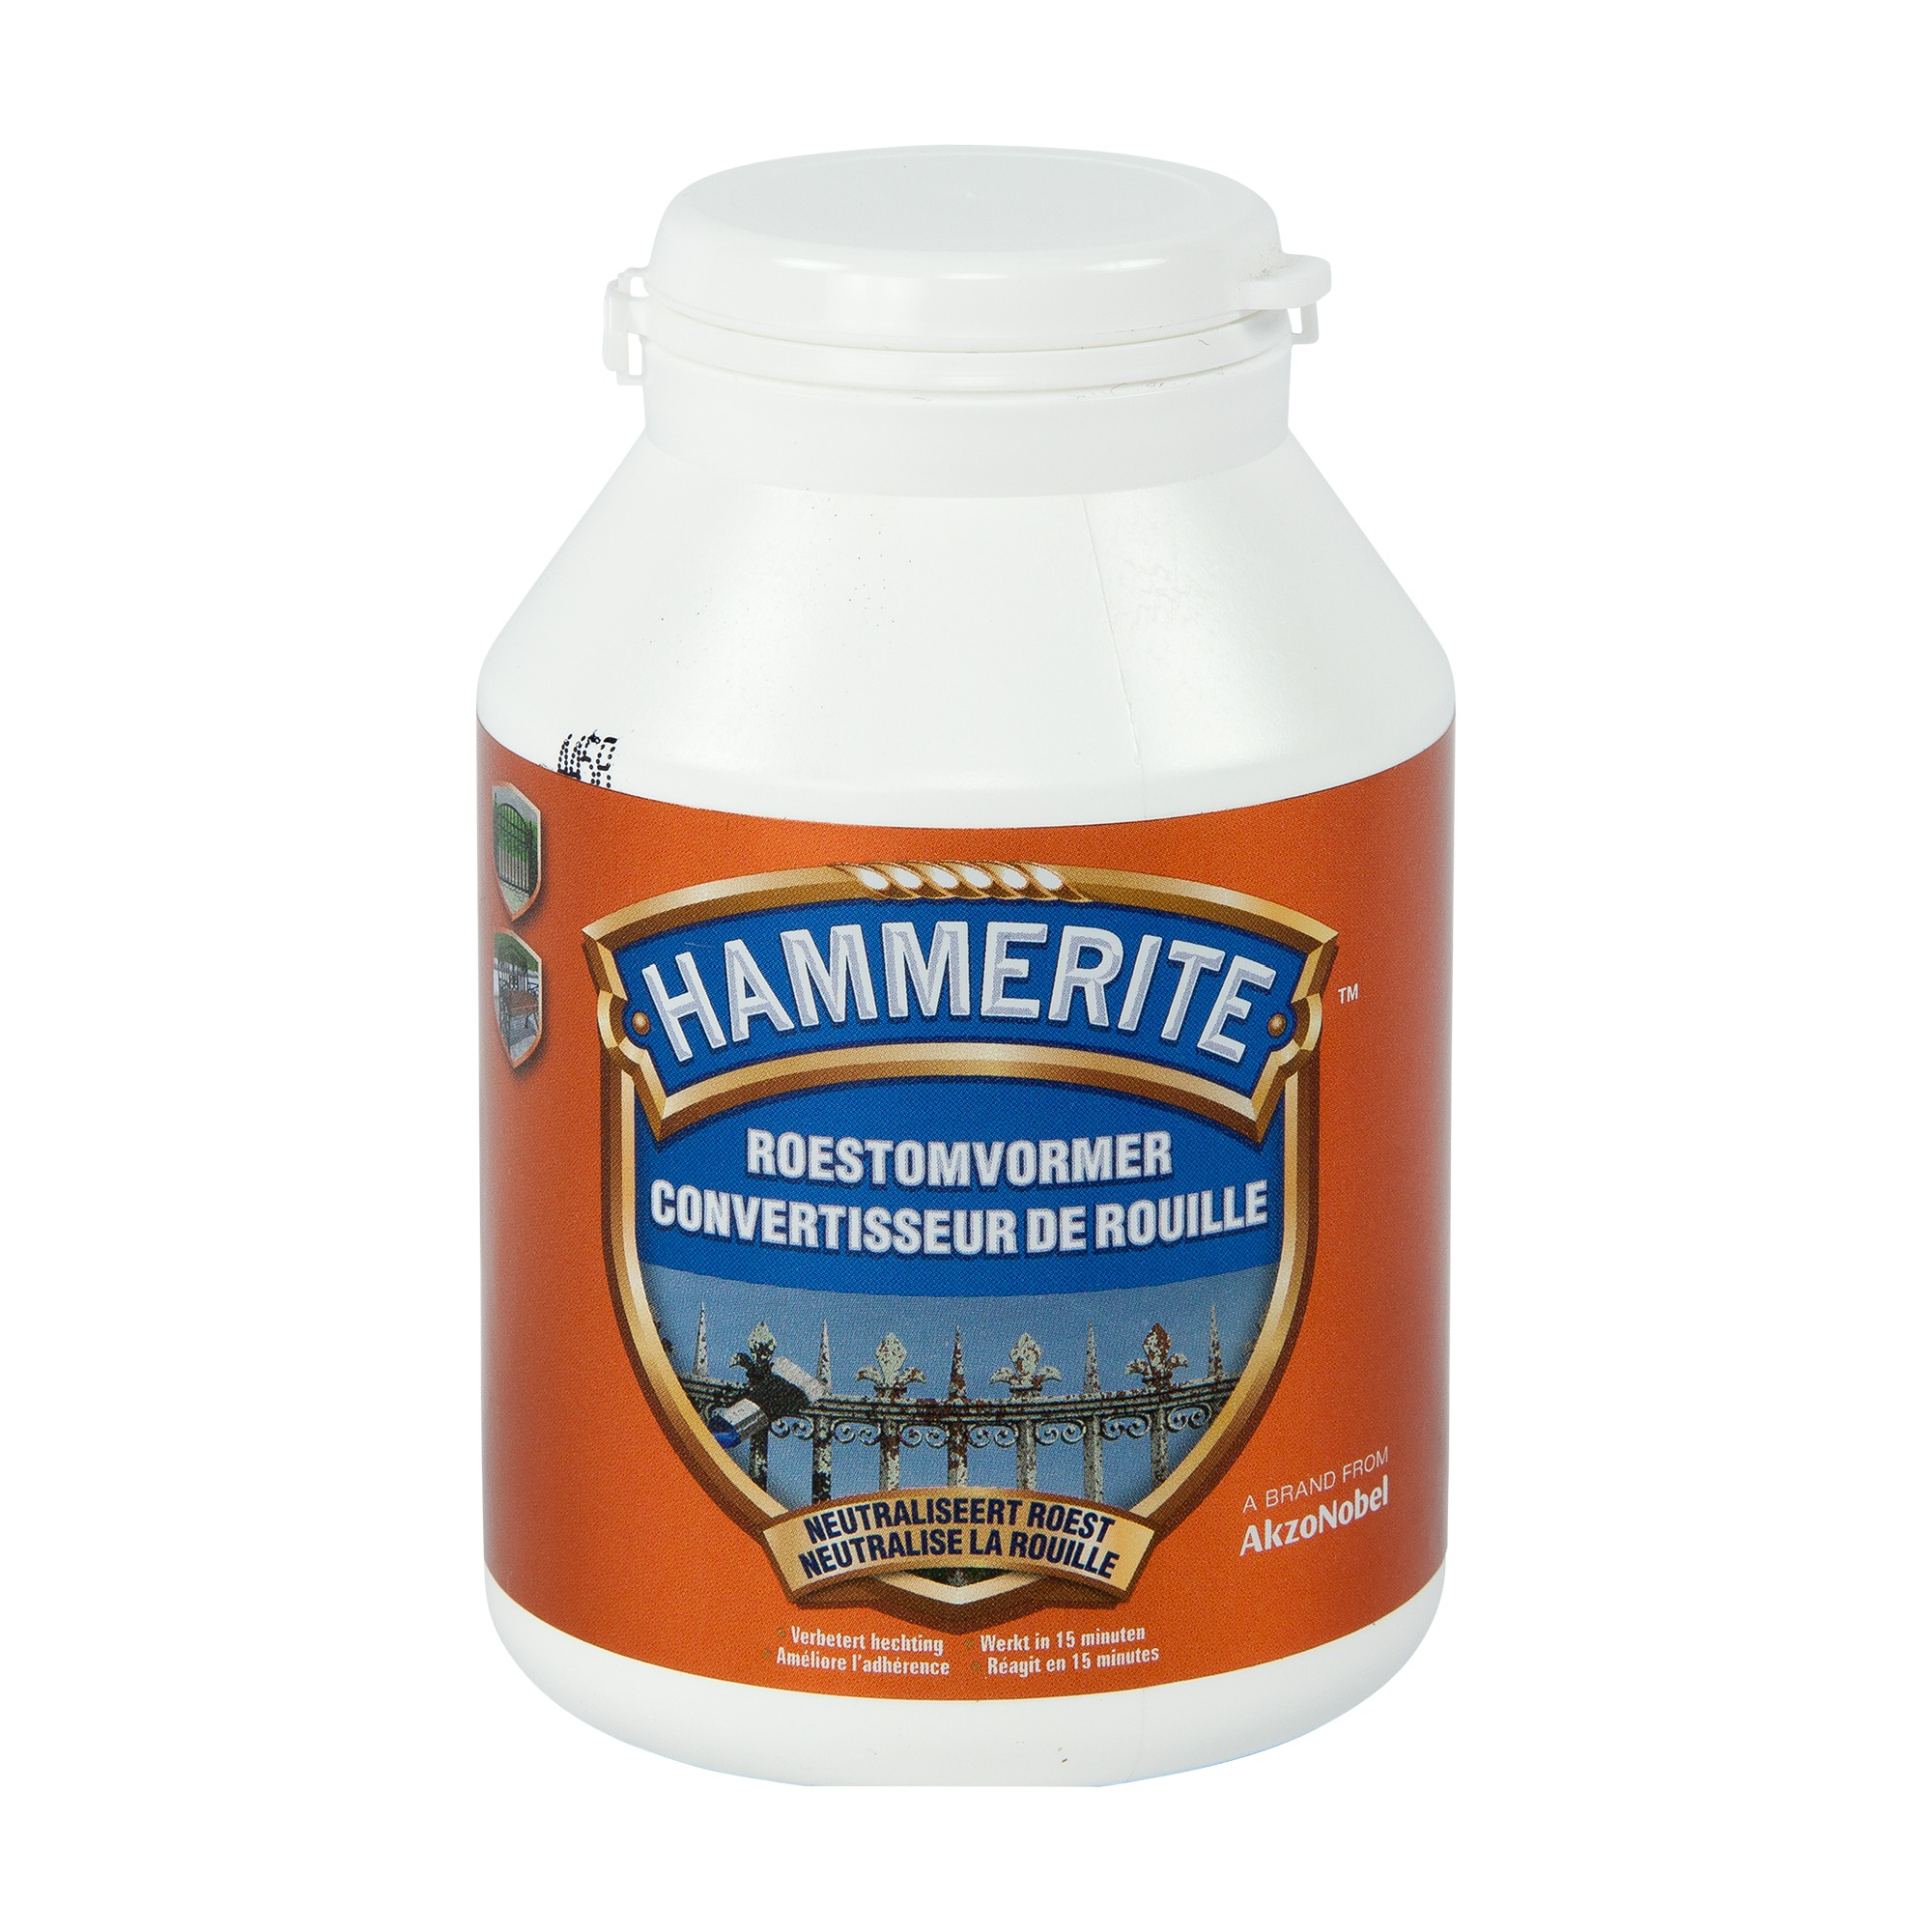 Hammerite roestomvormer 250 ml | Primer & grondlagen ...